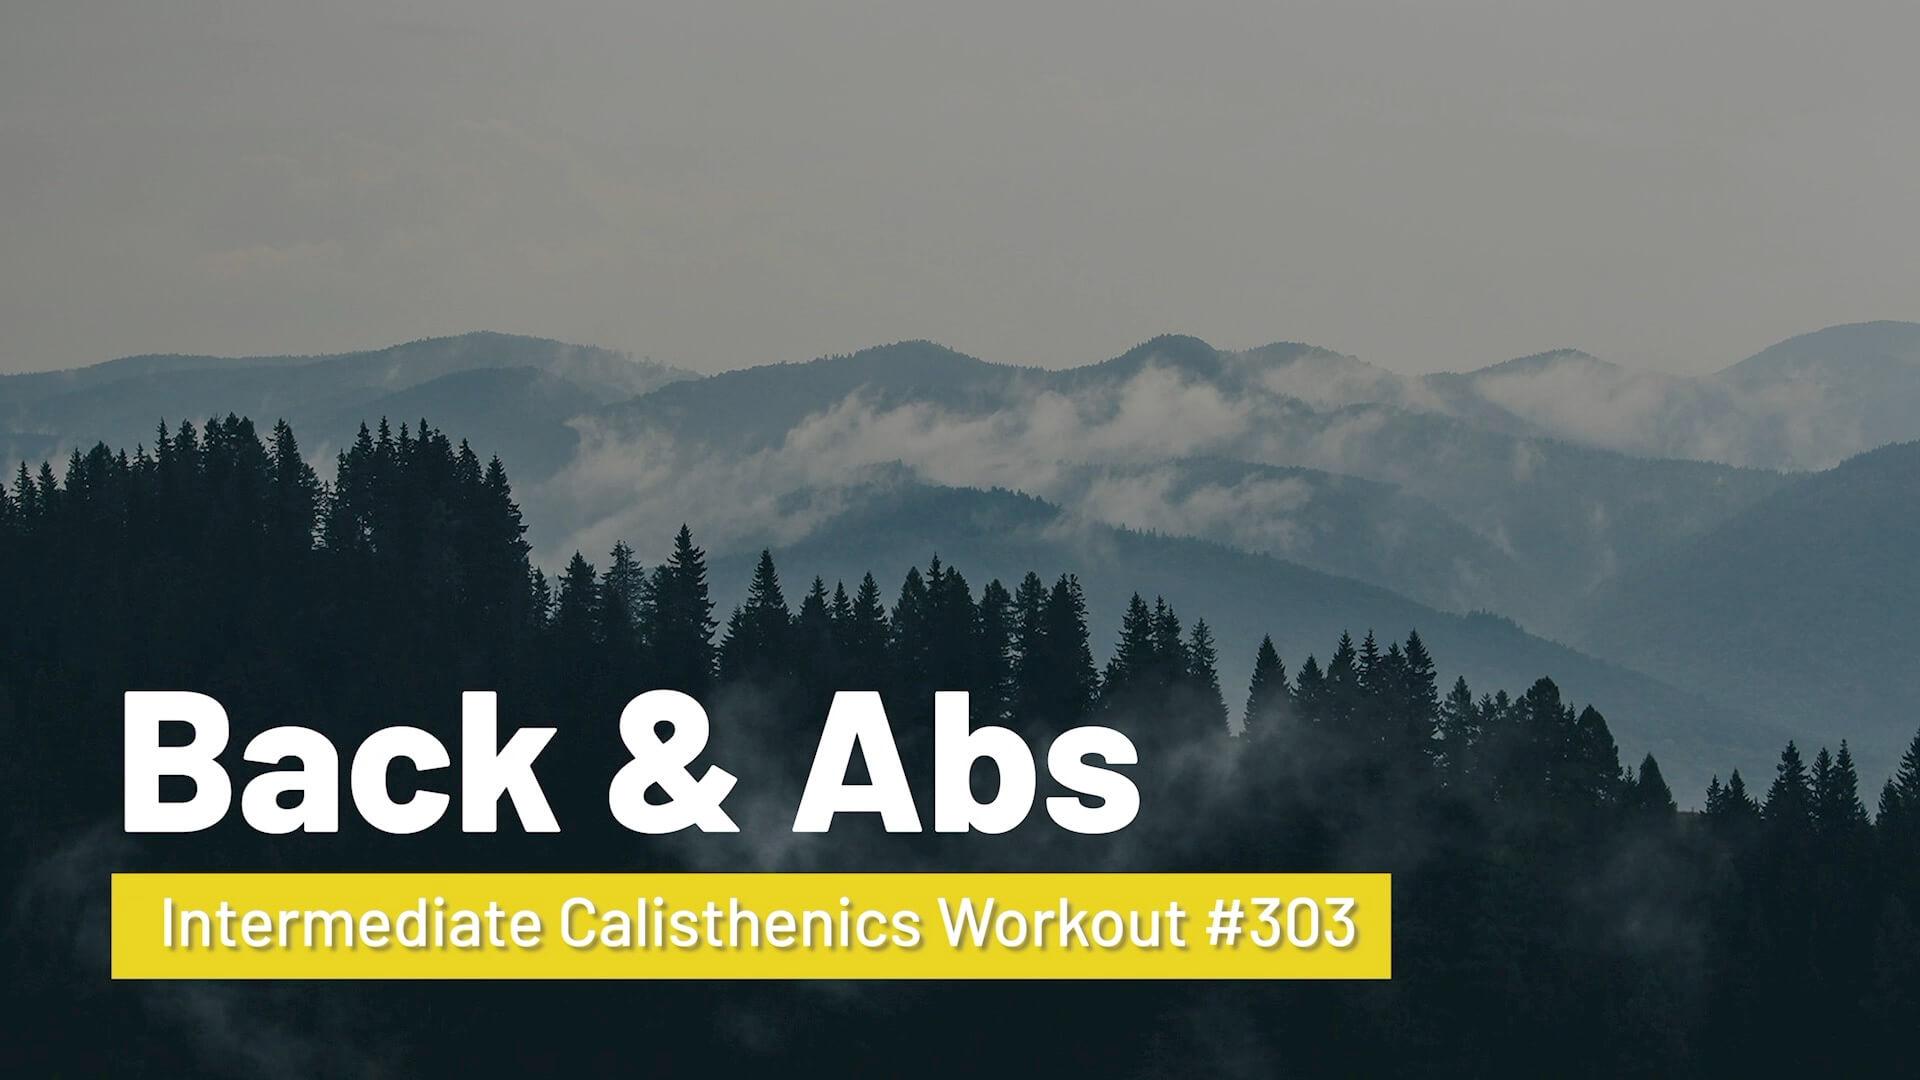 Workout #303